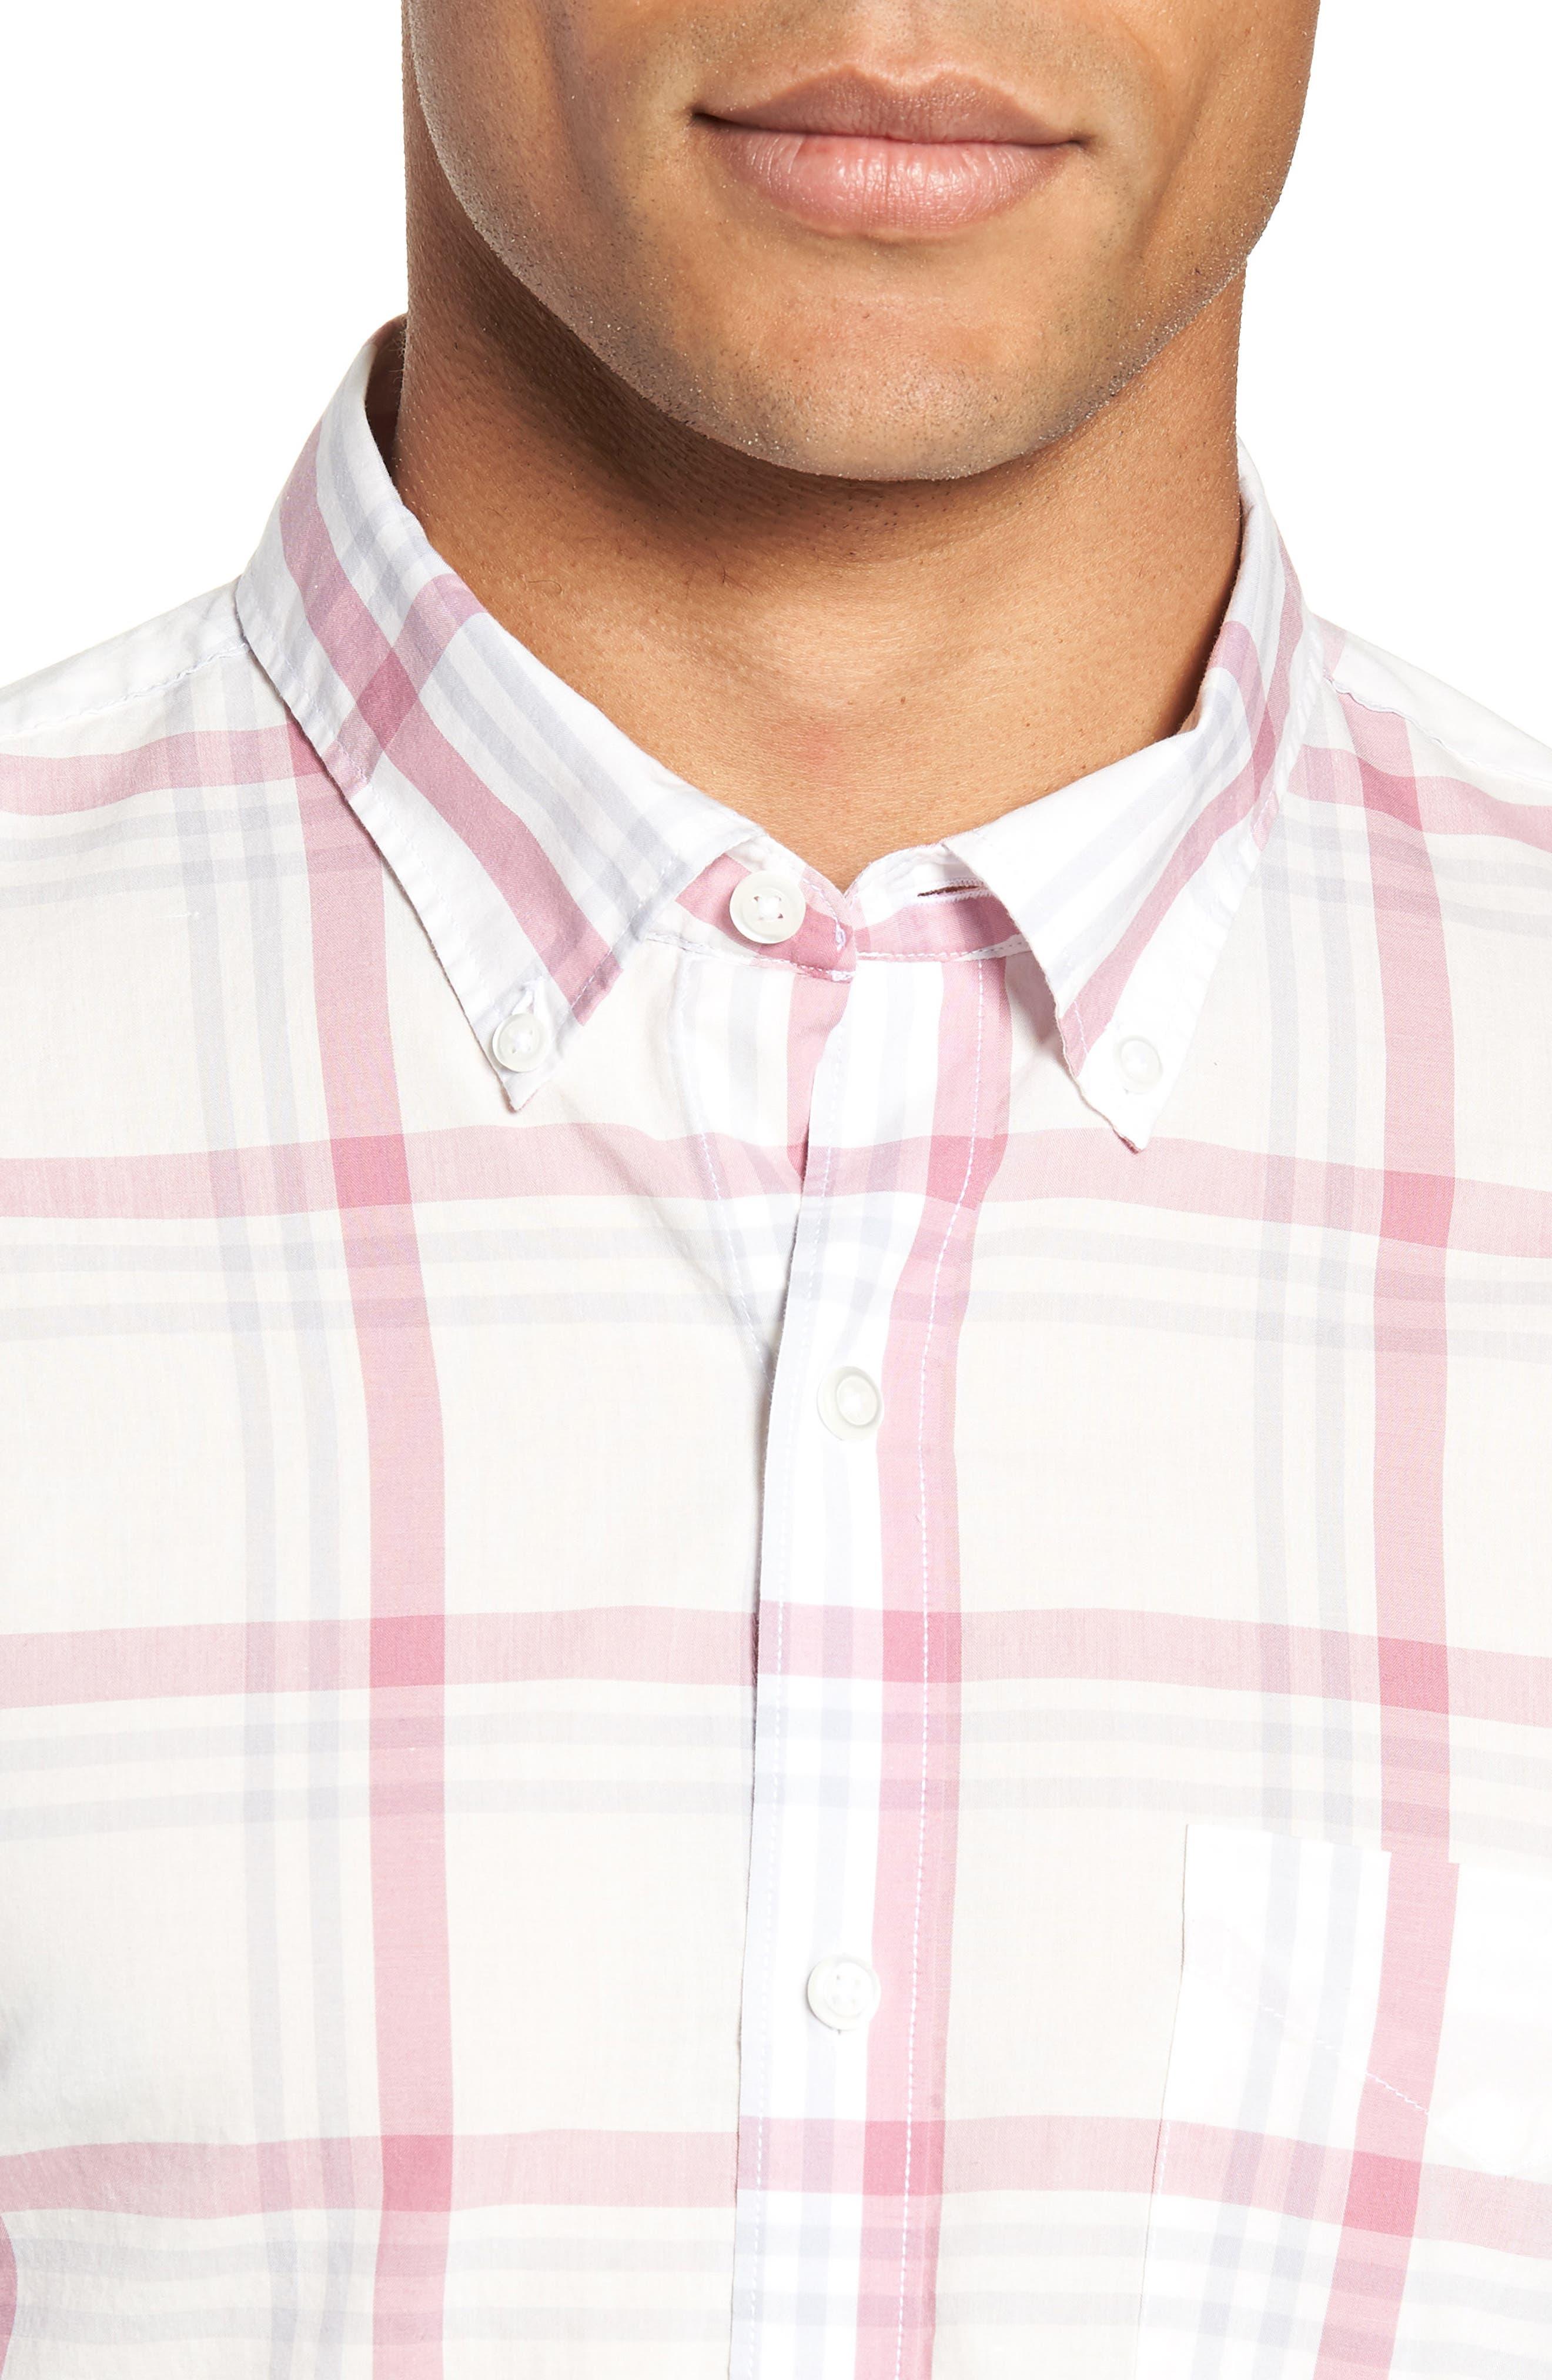 BONOBOS,                             Summerweight Slim Fit Plaid Sport Shirt,                             Alternate thumbnail 2, color,                             100